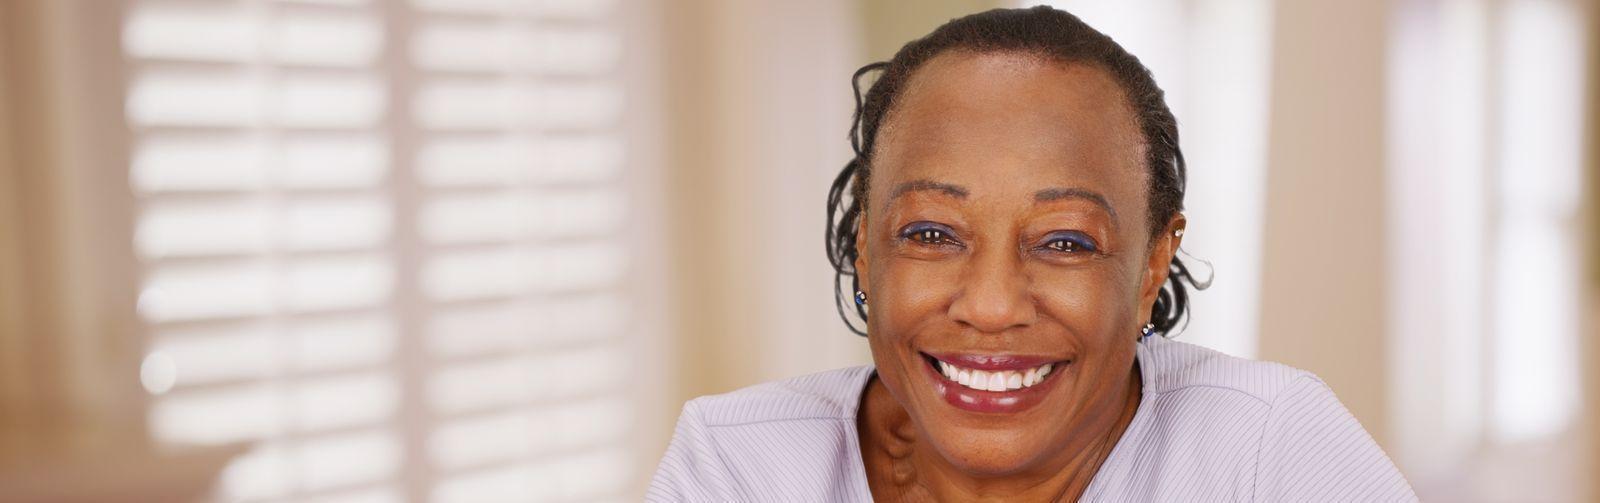 Stock photo Black lady